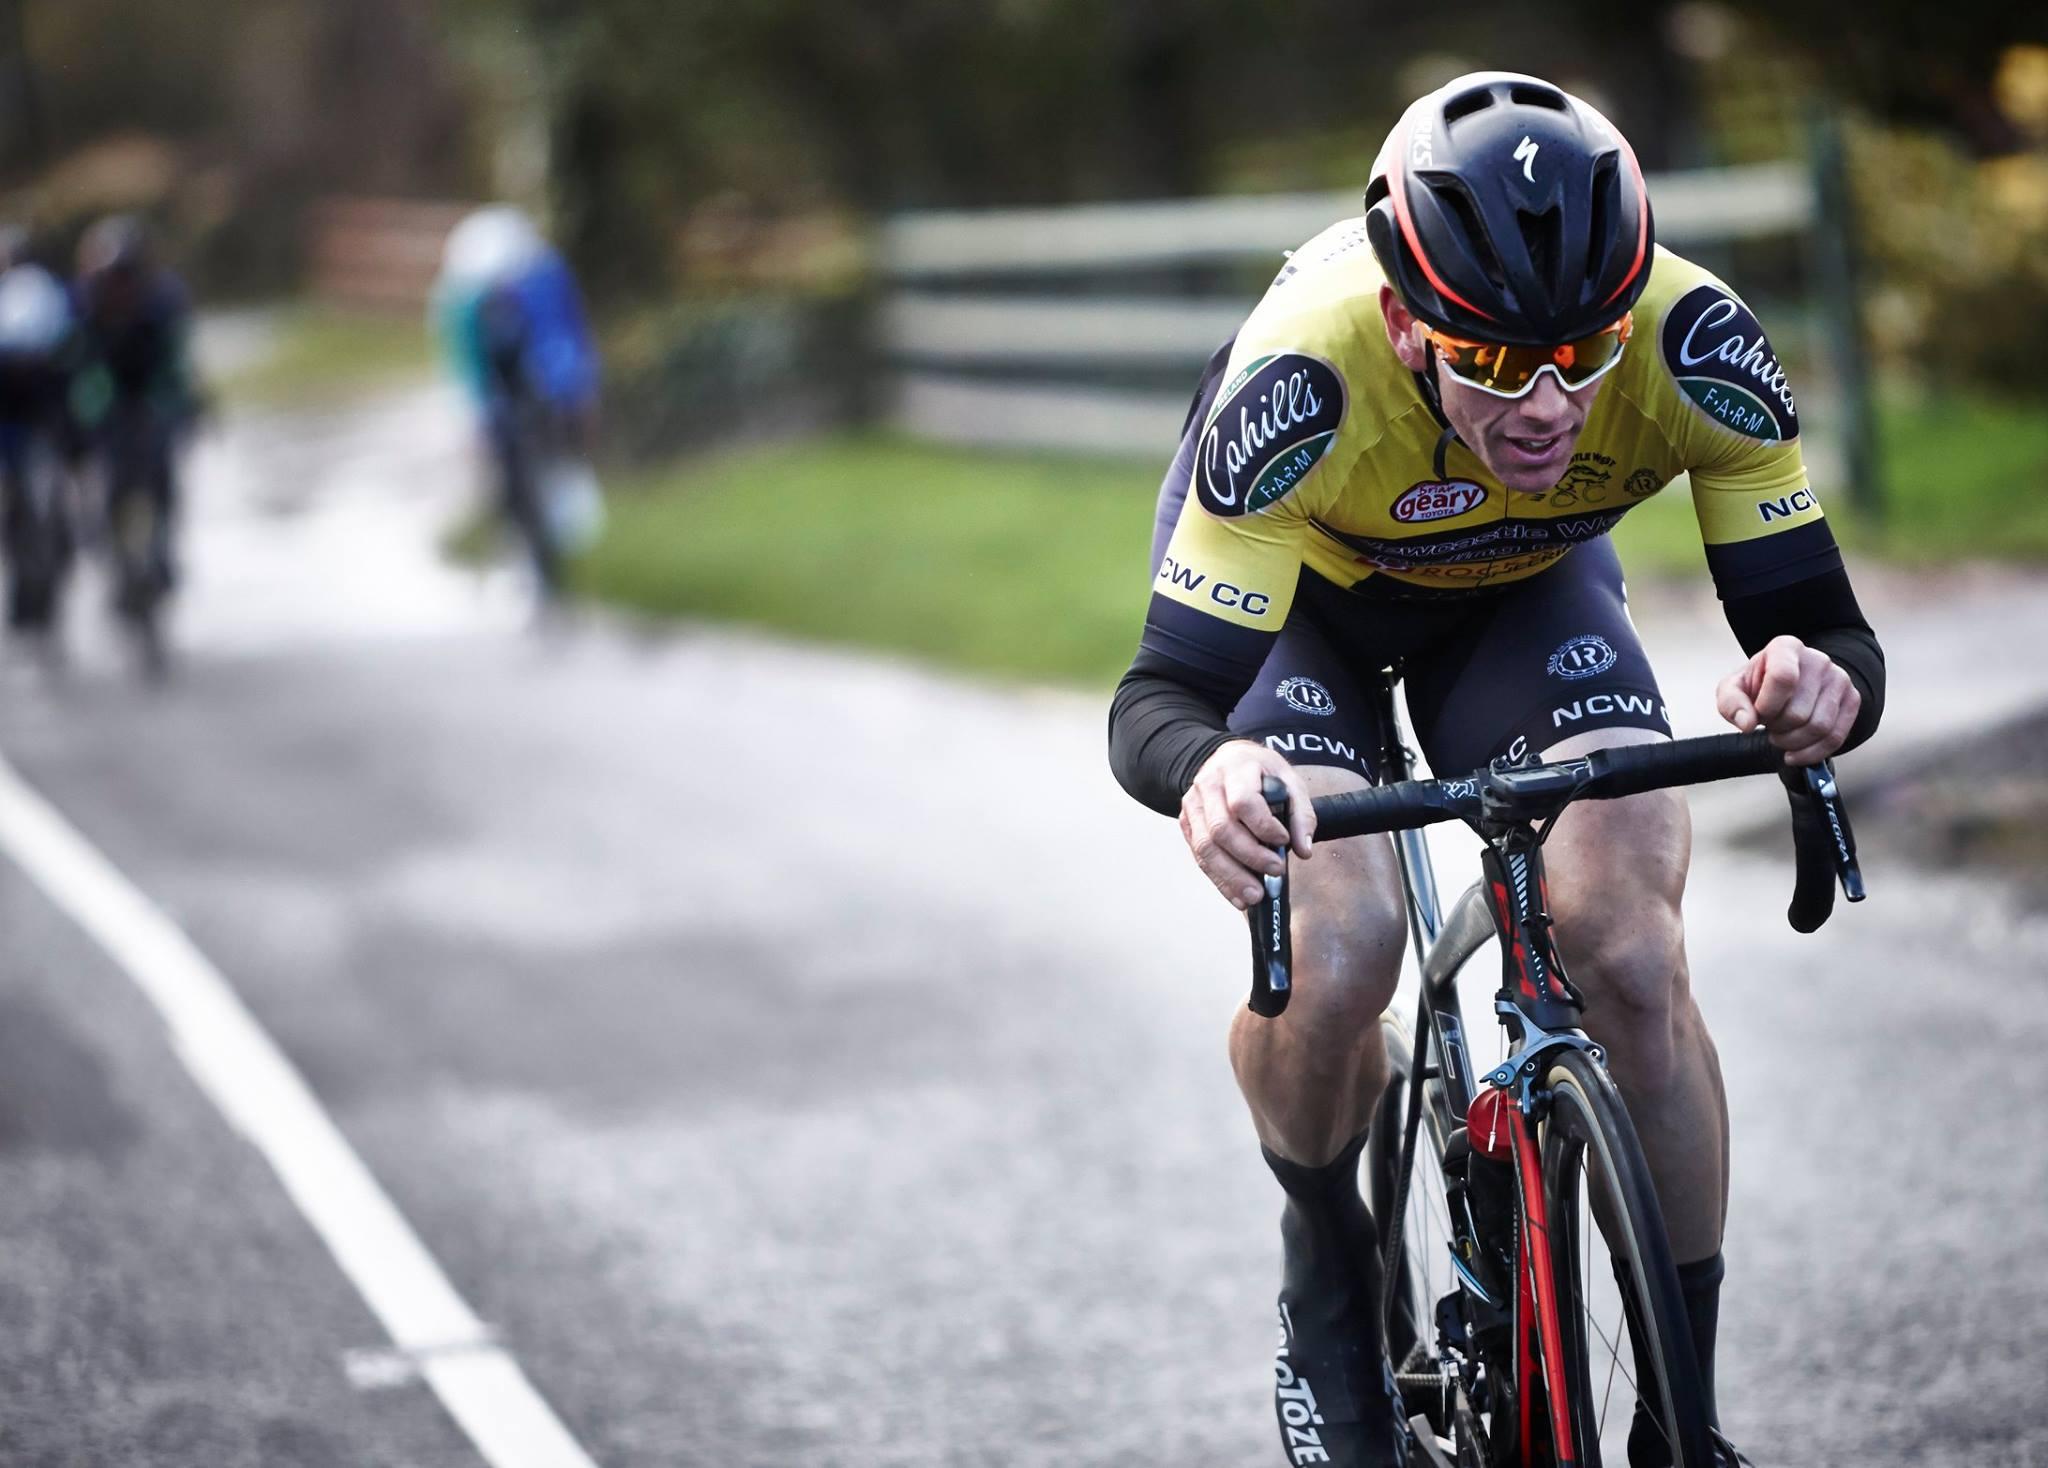 Cyclist photo